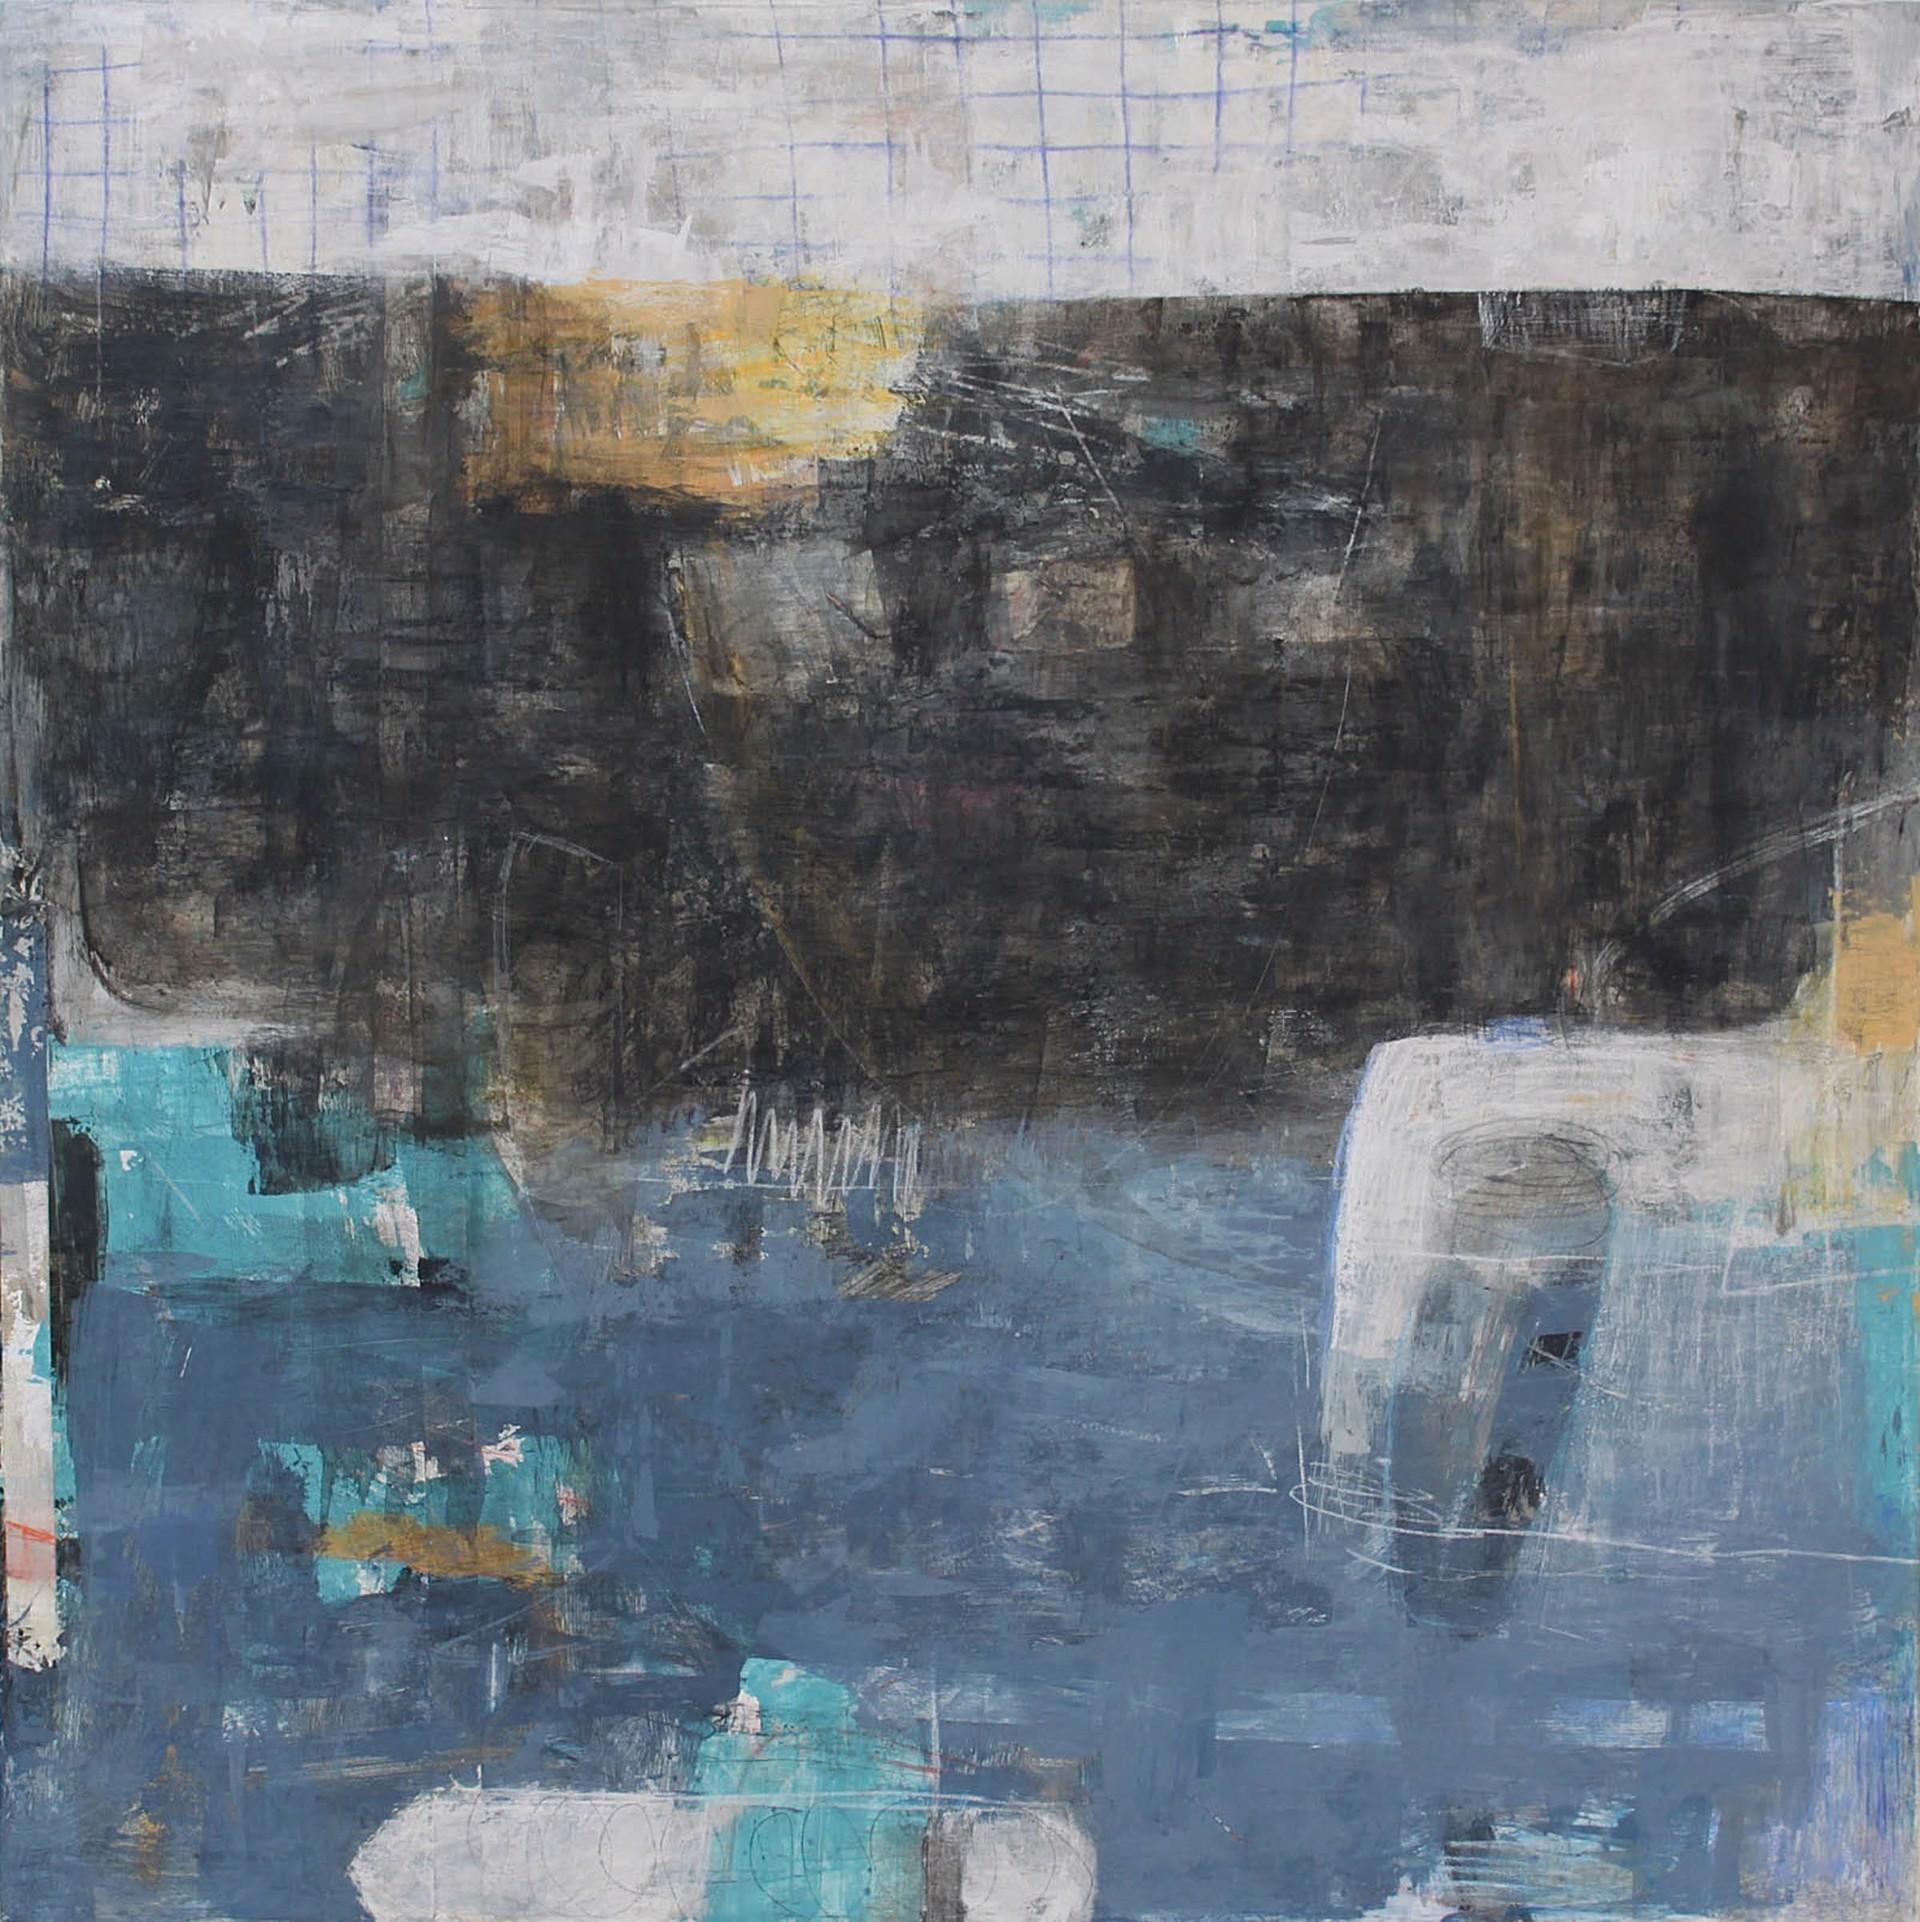 Sky Event by Paul Brigham